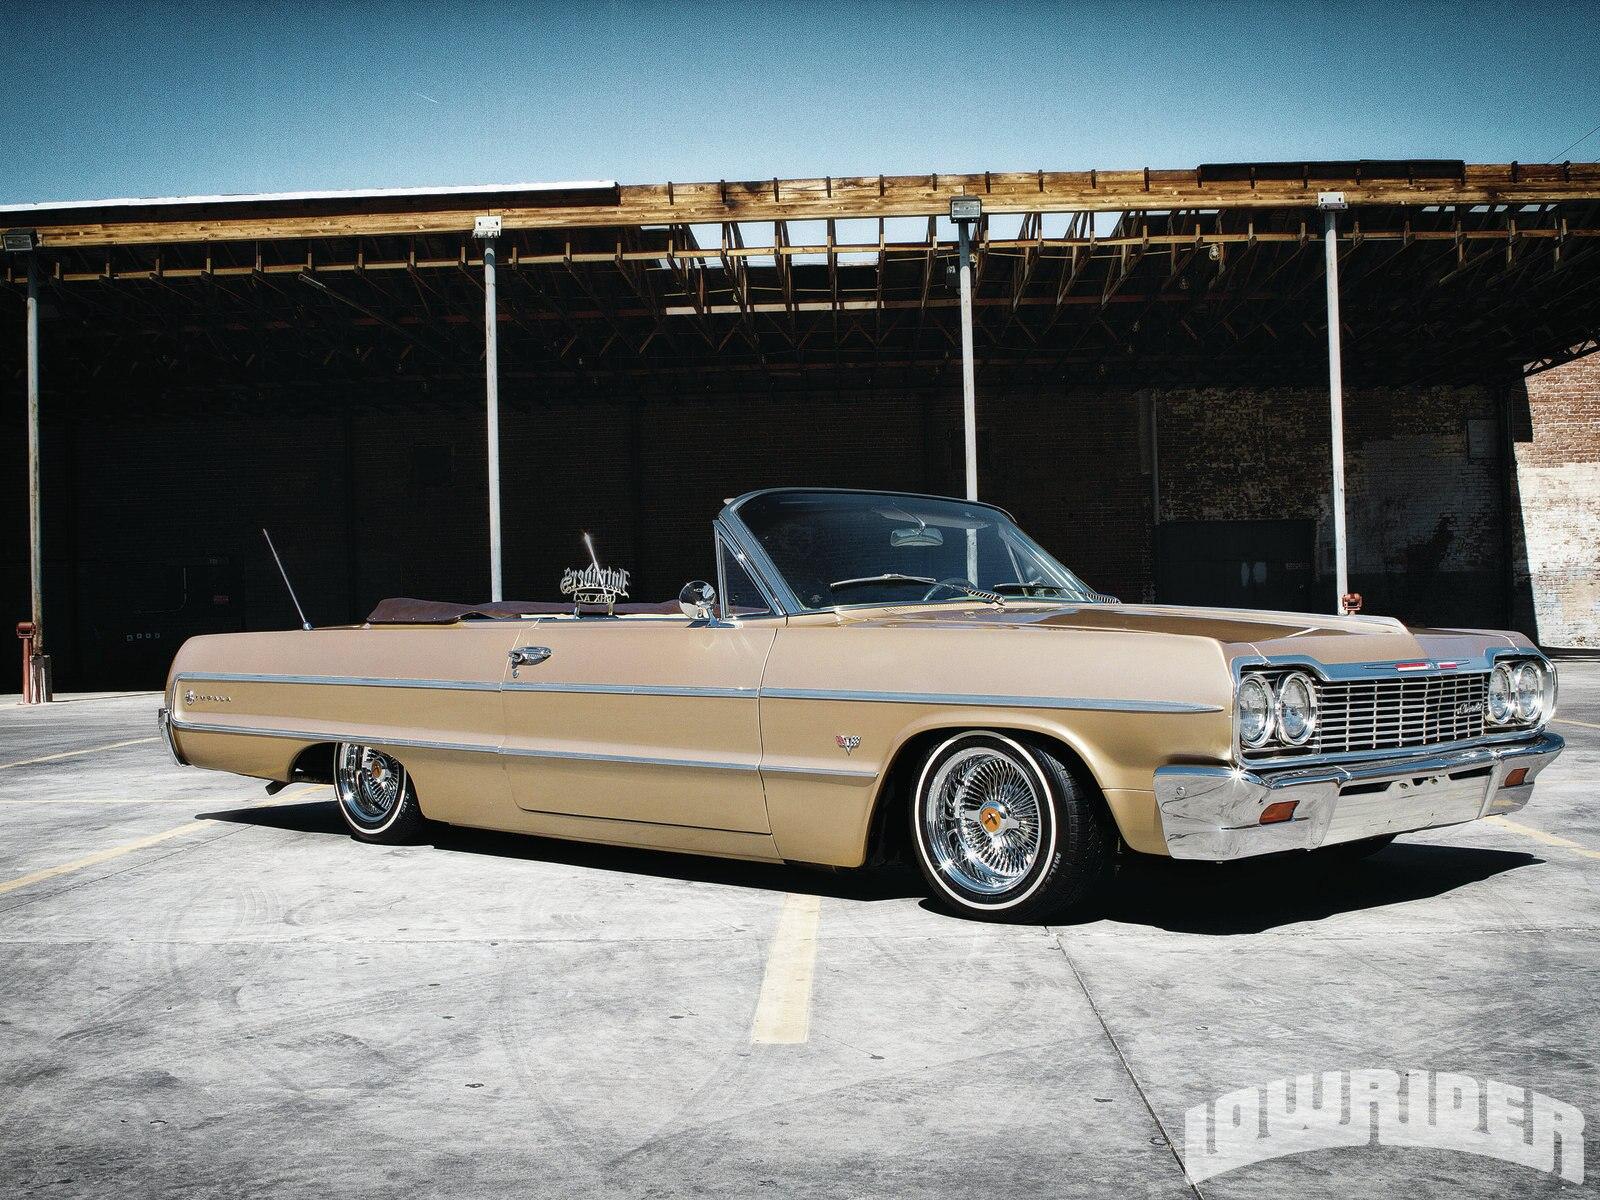 hight resolution of 1201 lrmp 01 o 1964 chevrolet impala lowrider